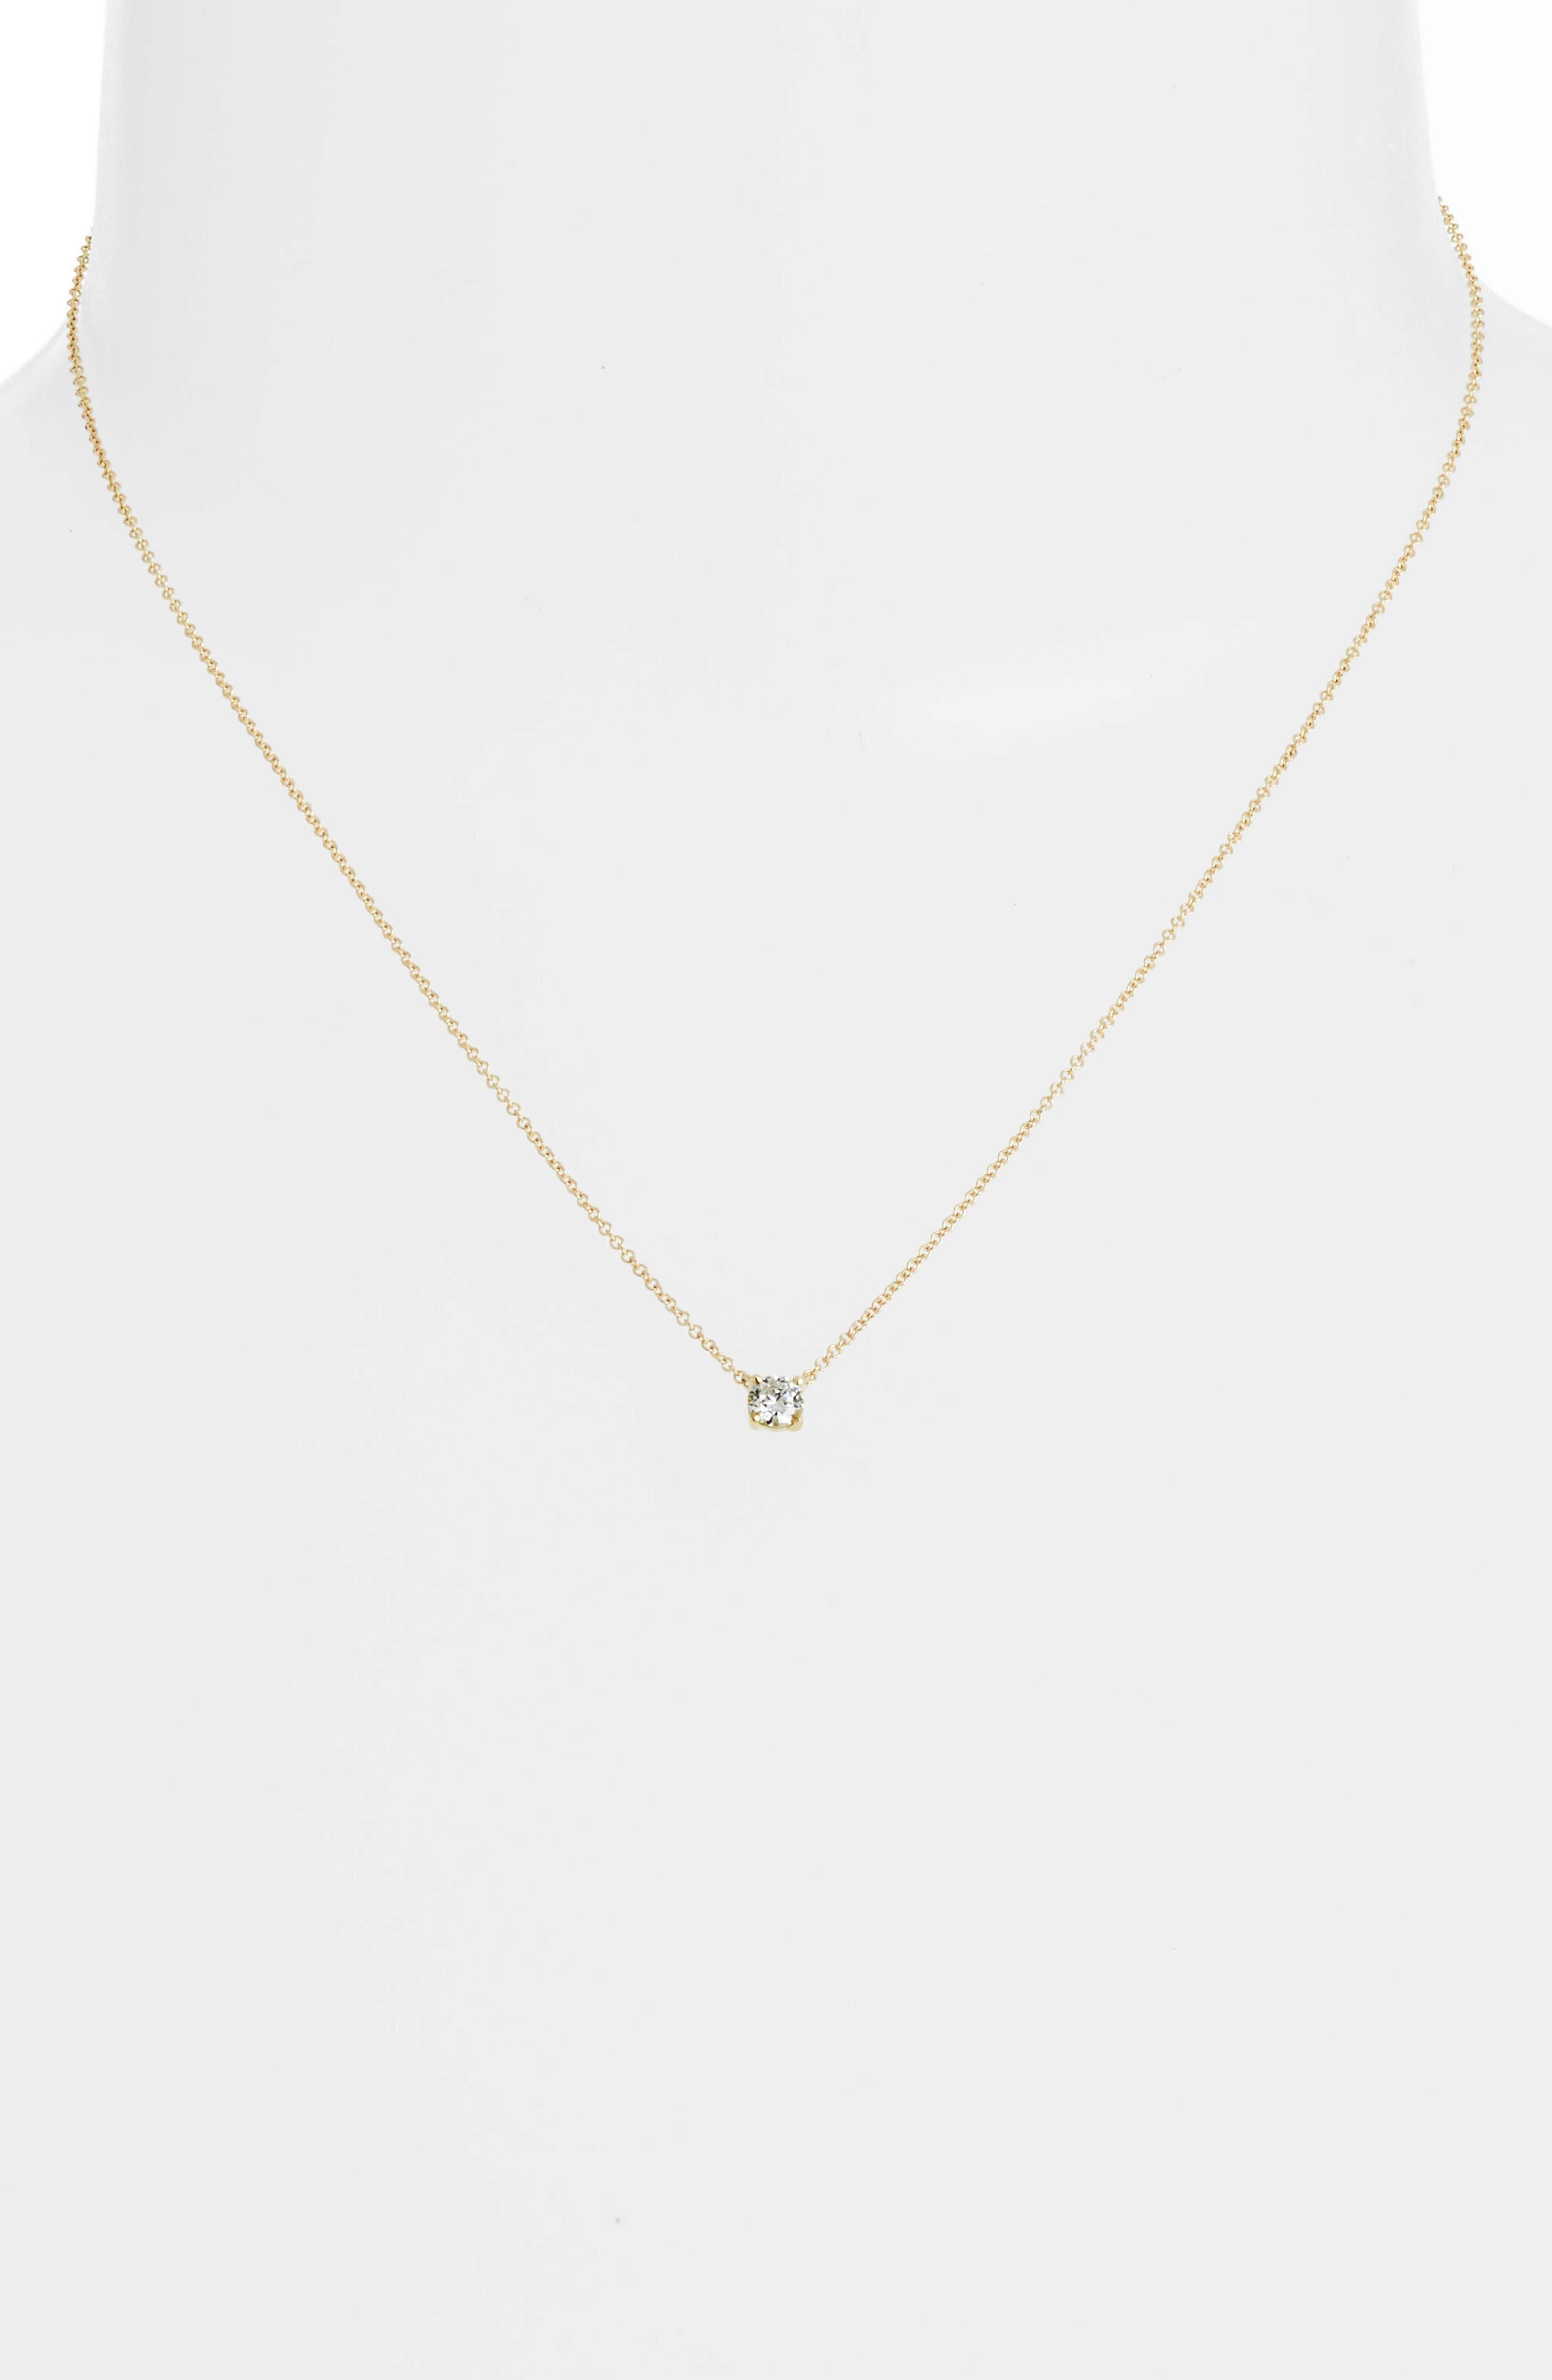 BONY LEVY, Liora Solitaire Diamond Pendant Necklace, Alternate thumbnail 2, color, YELLOW GOLD